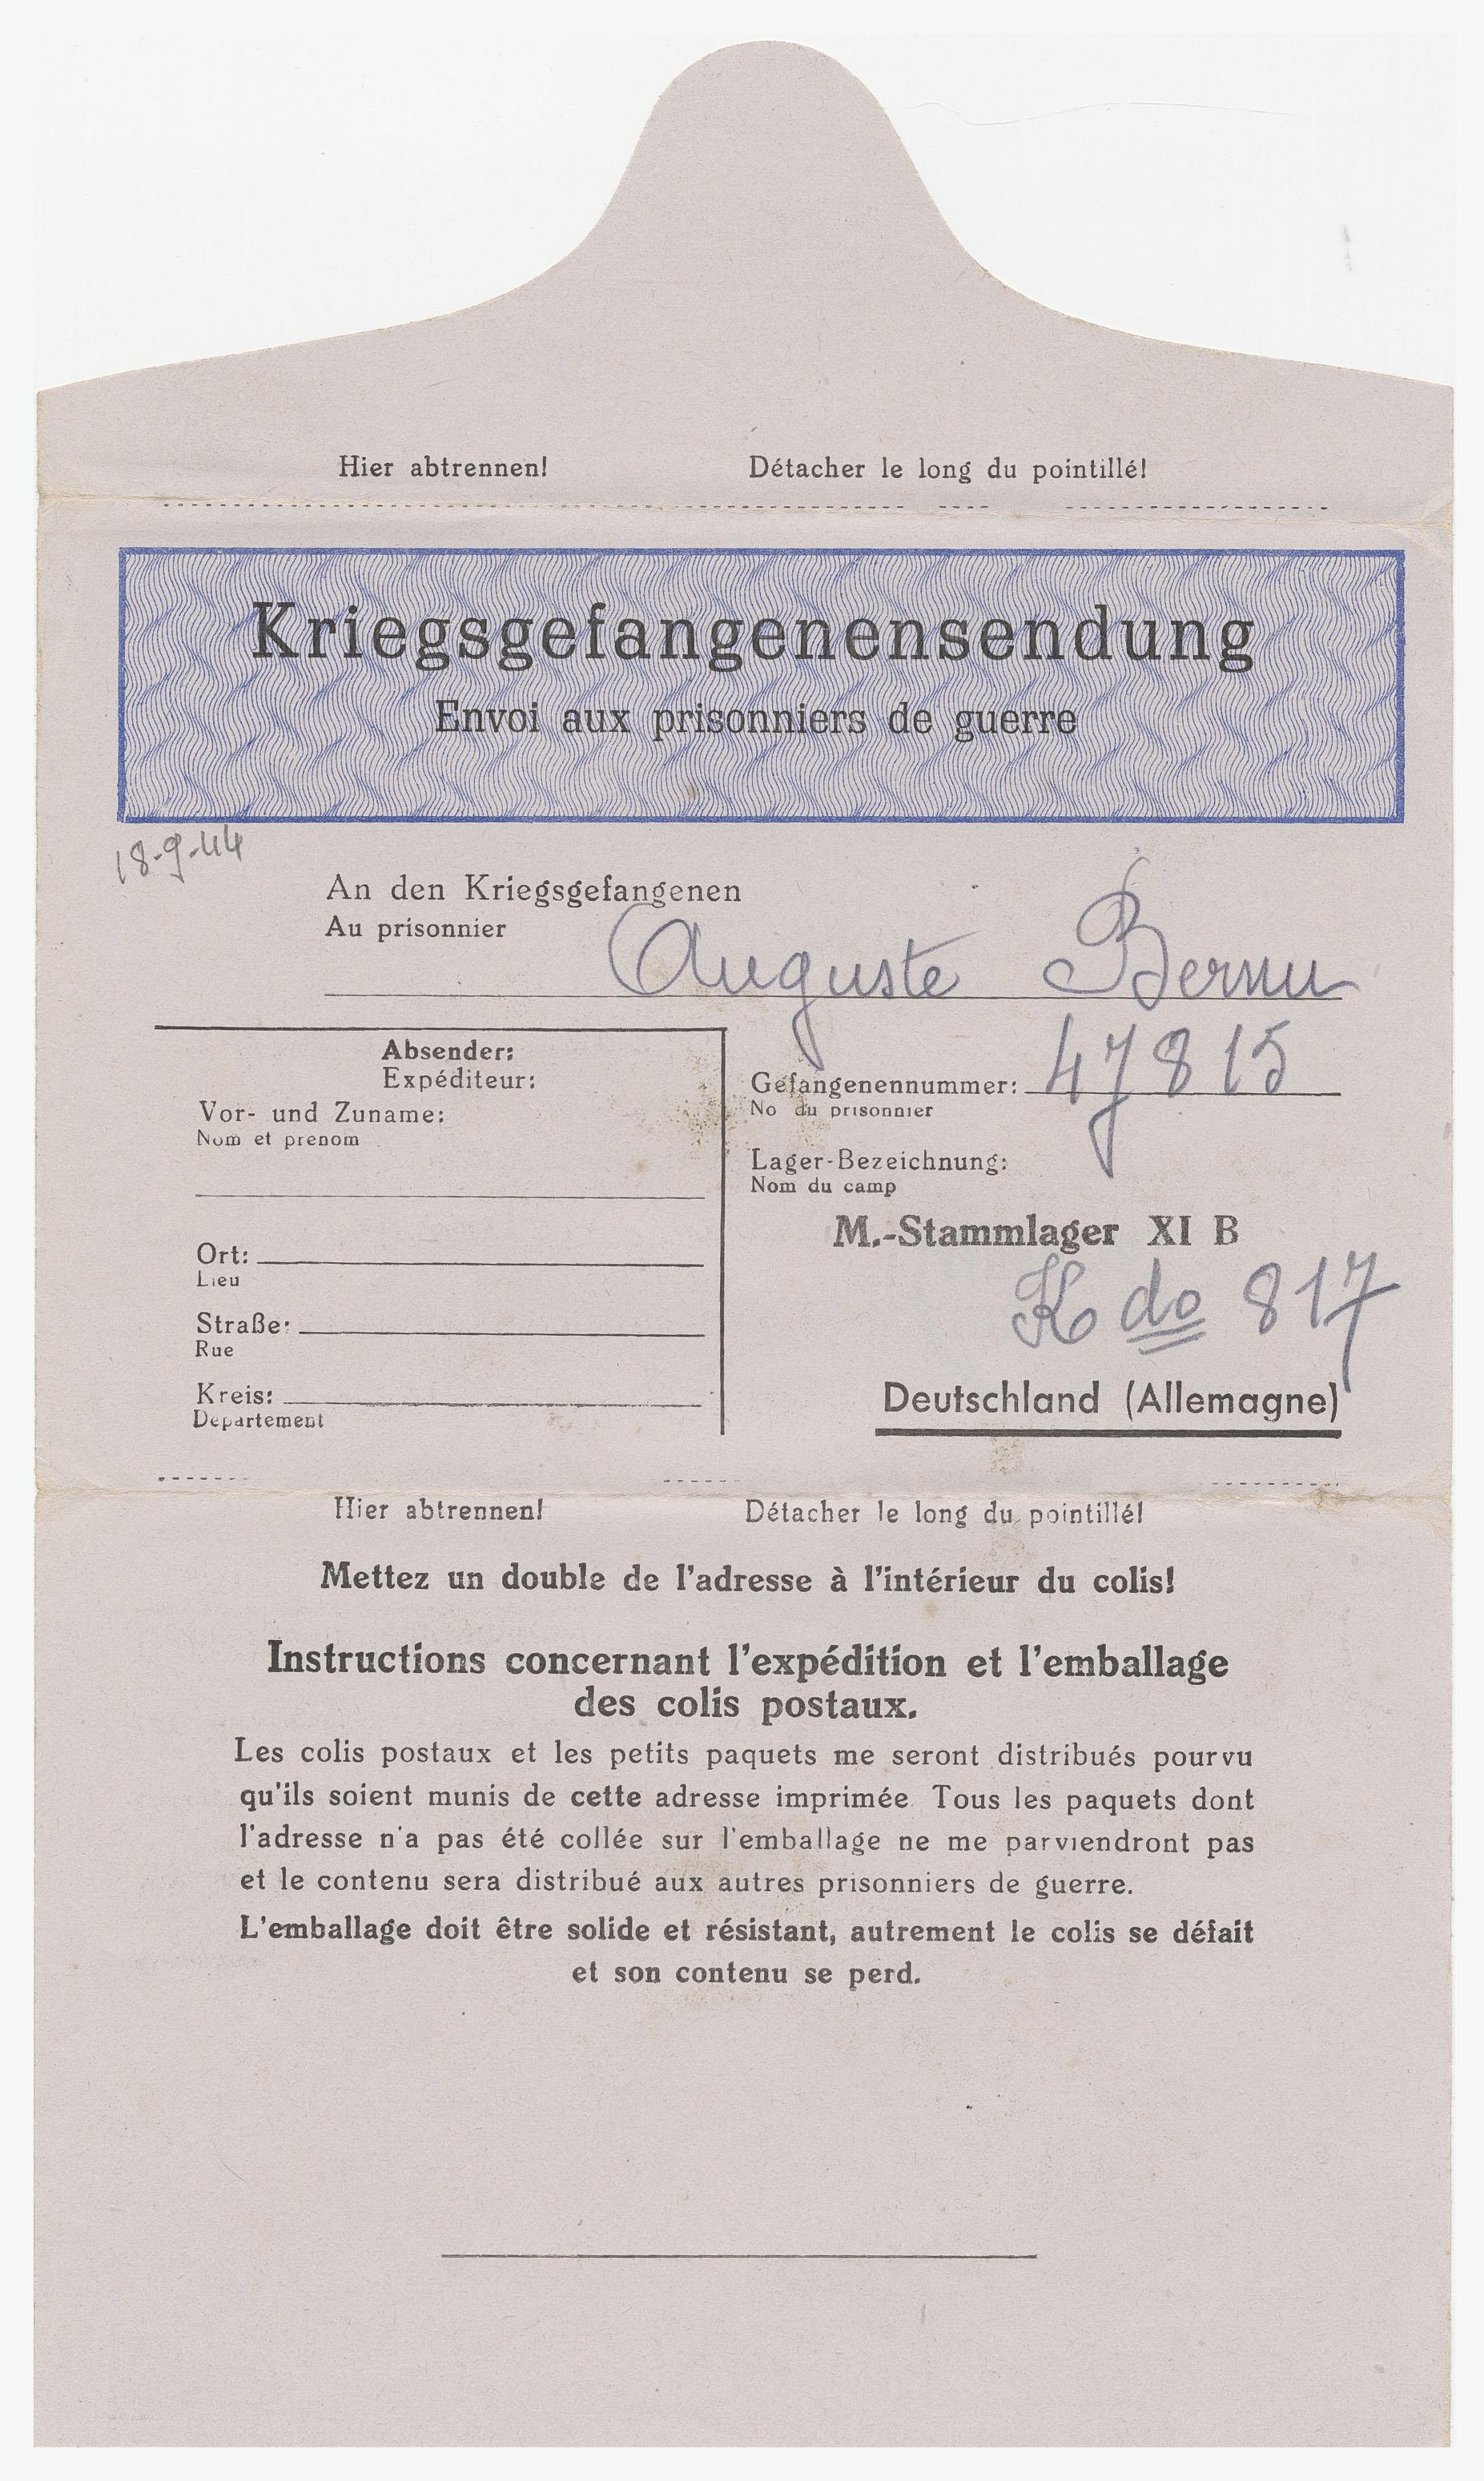 lettercard, from: bernu, auguste to: madame bernu